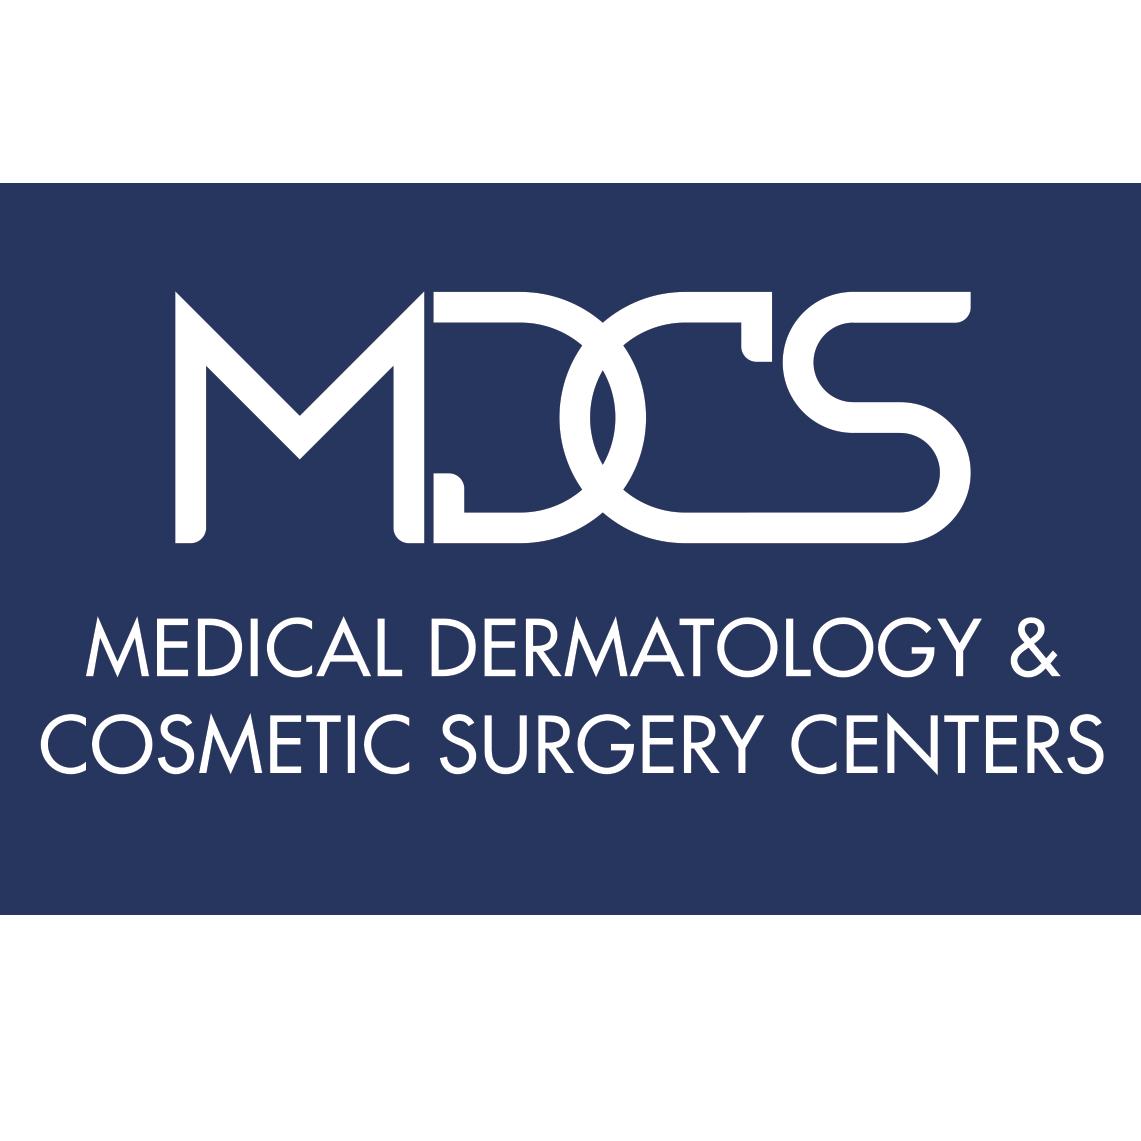 Snehal Amin, MD, Mohs Skin Cancer Surgeon at MDCS